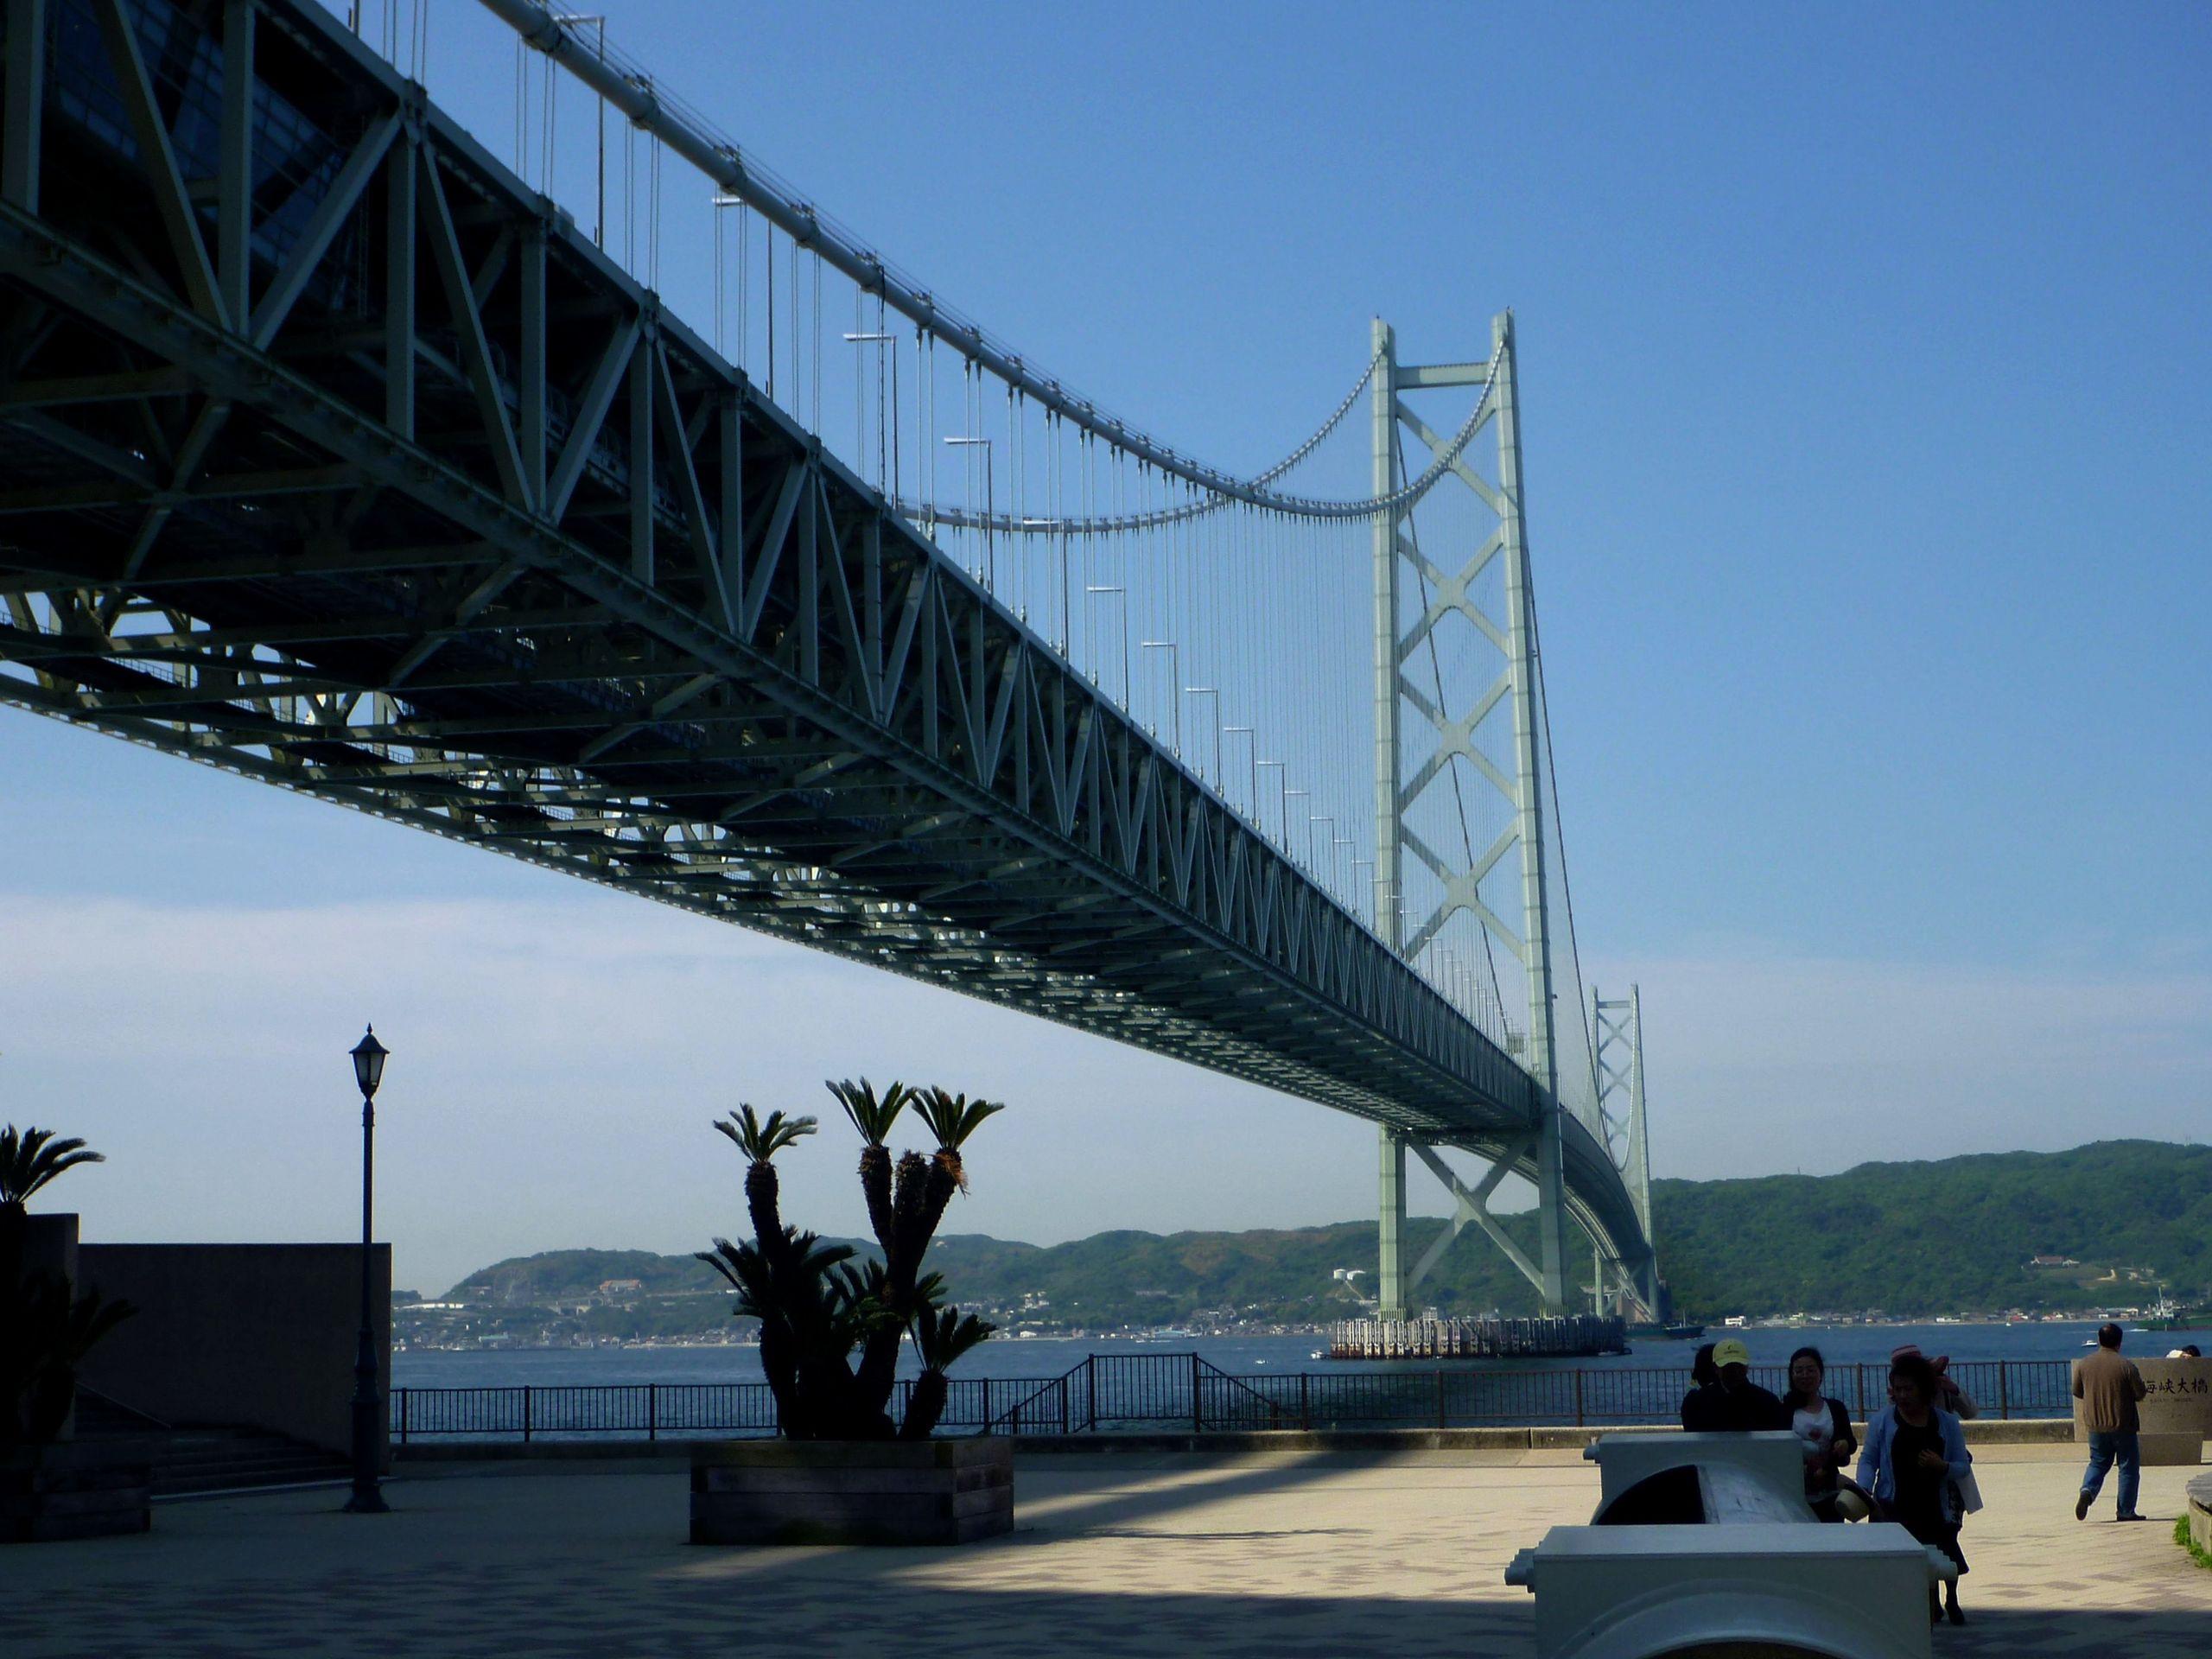 akashi kaikyo bridge construction process